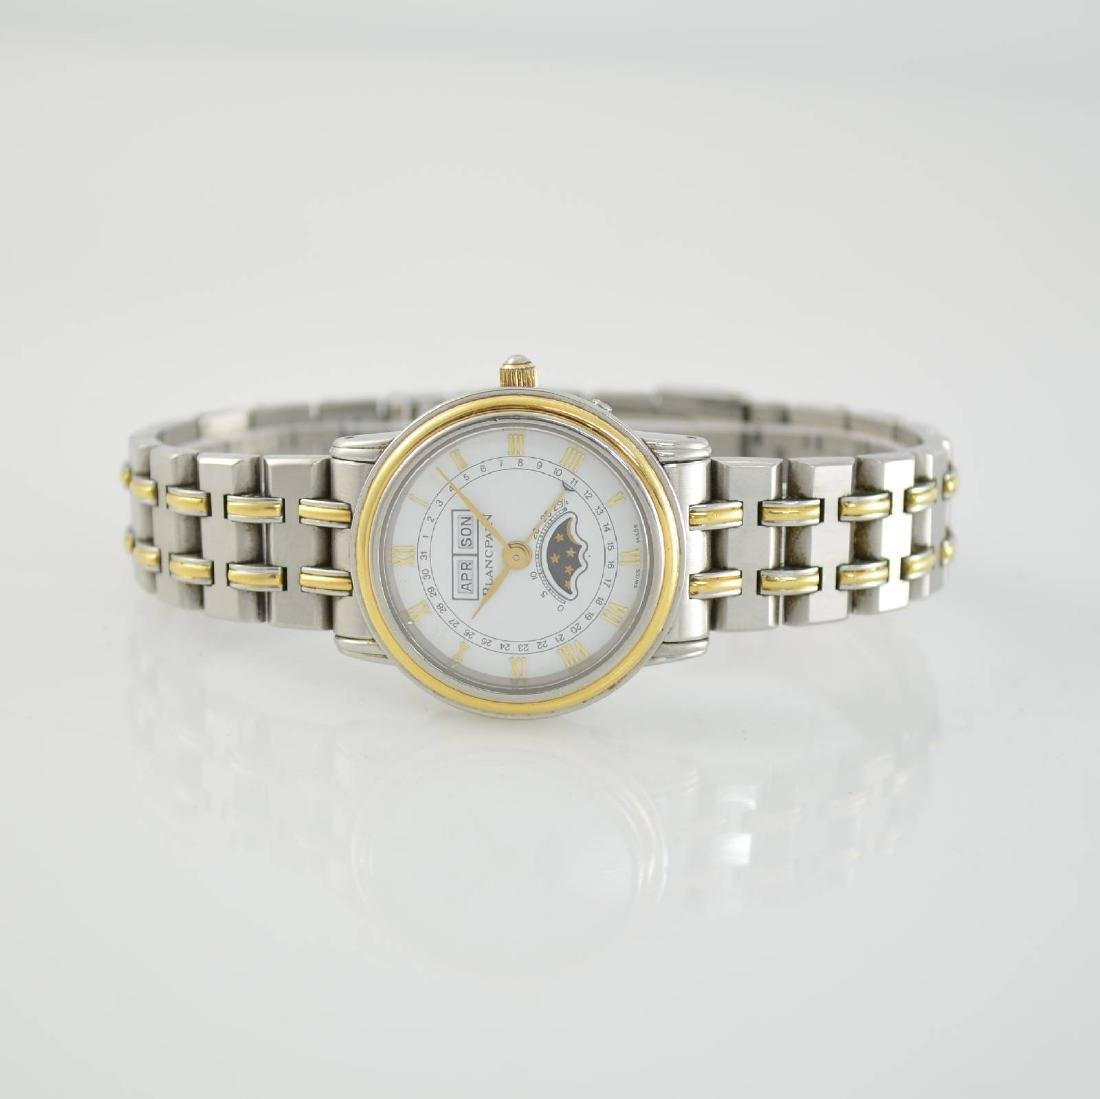 BLANCPAIN ladies wristwatch with complete calendar